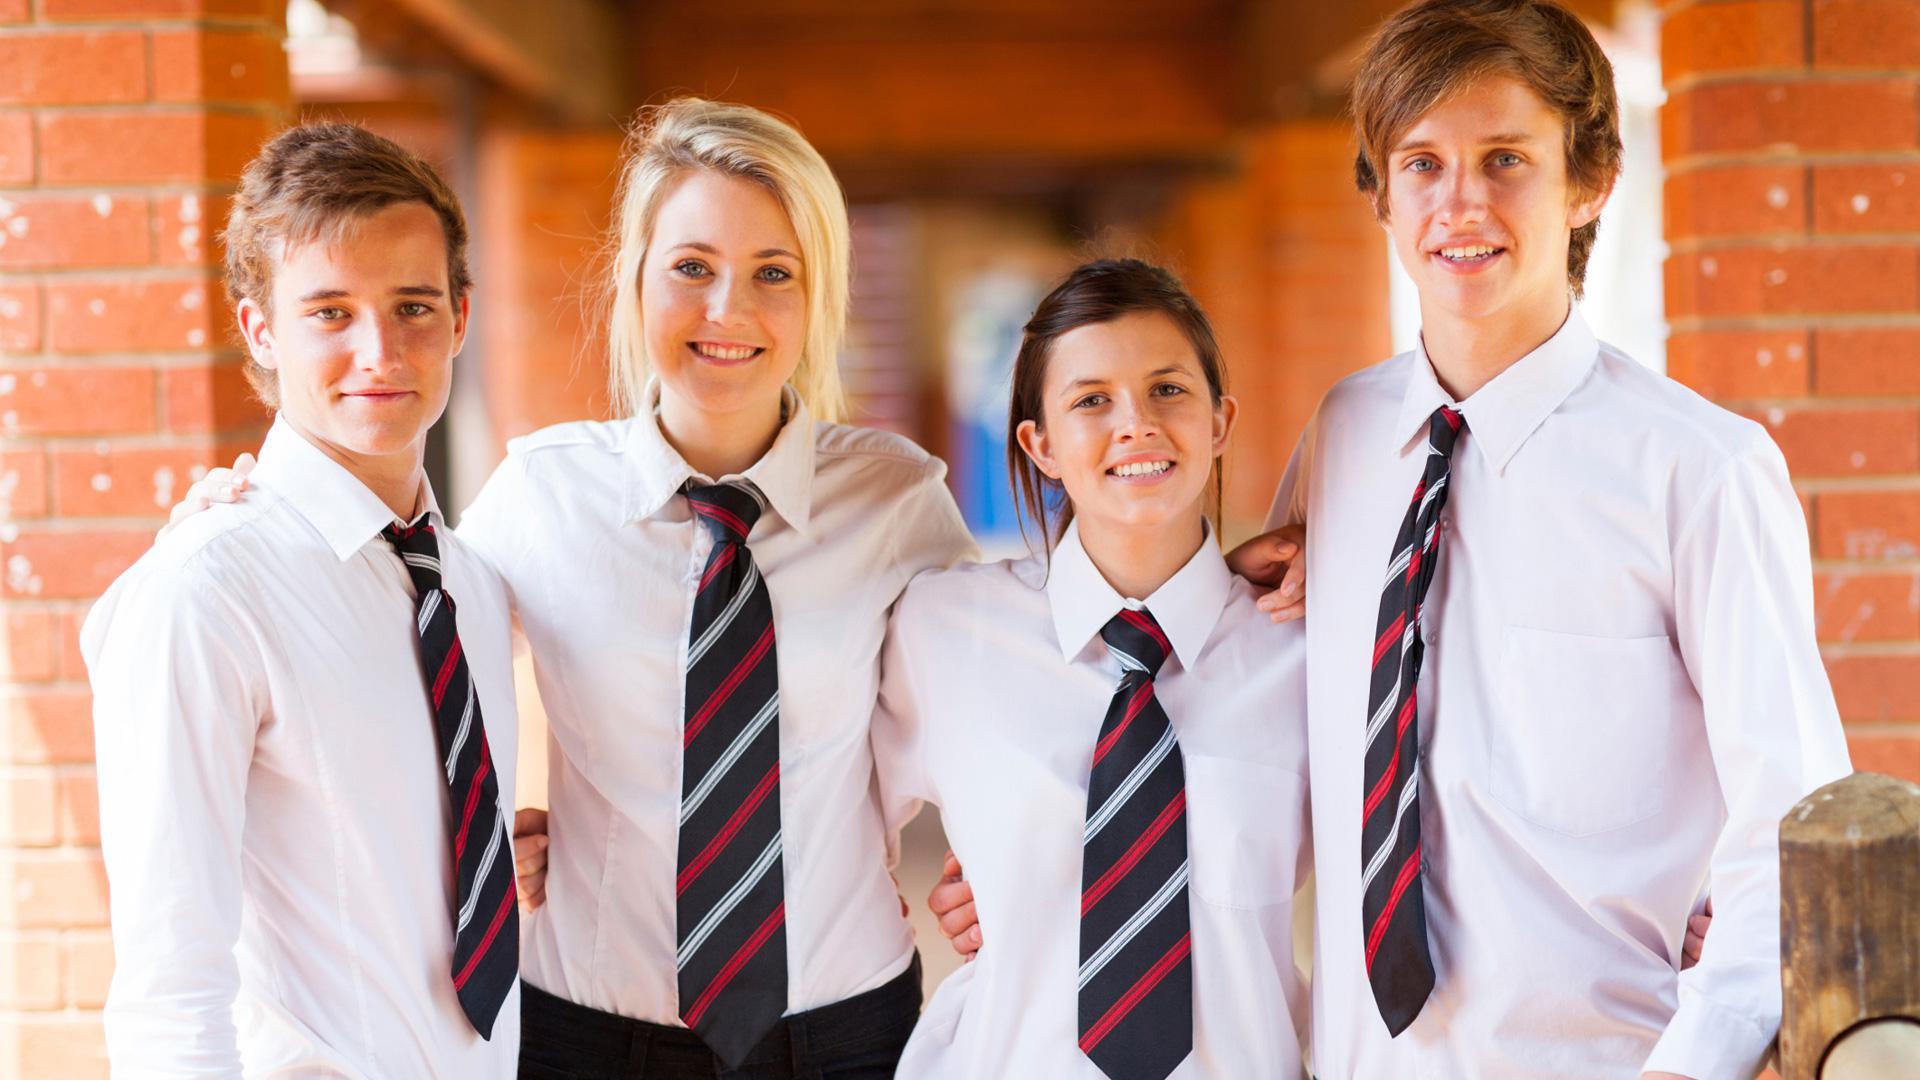 benefit school uniforms essay